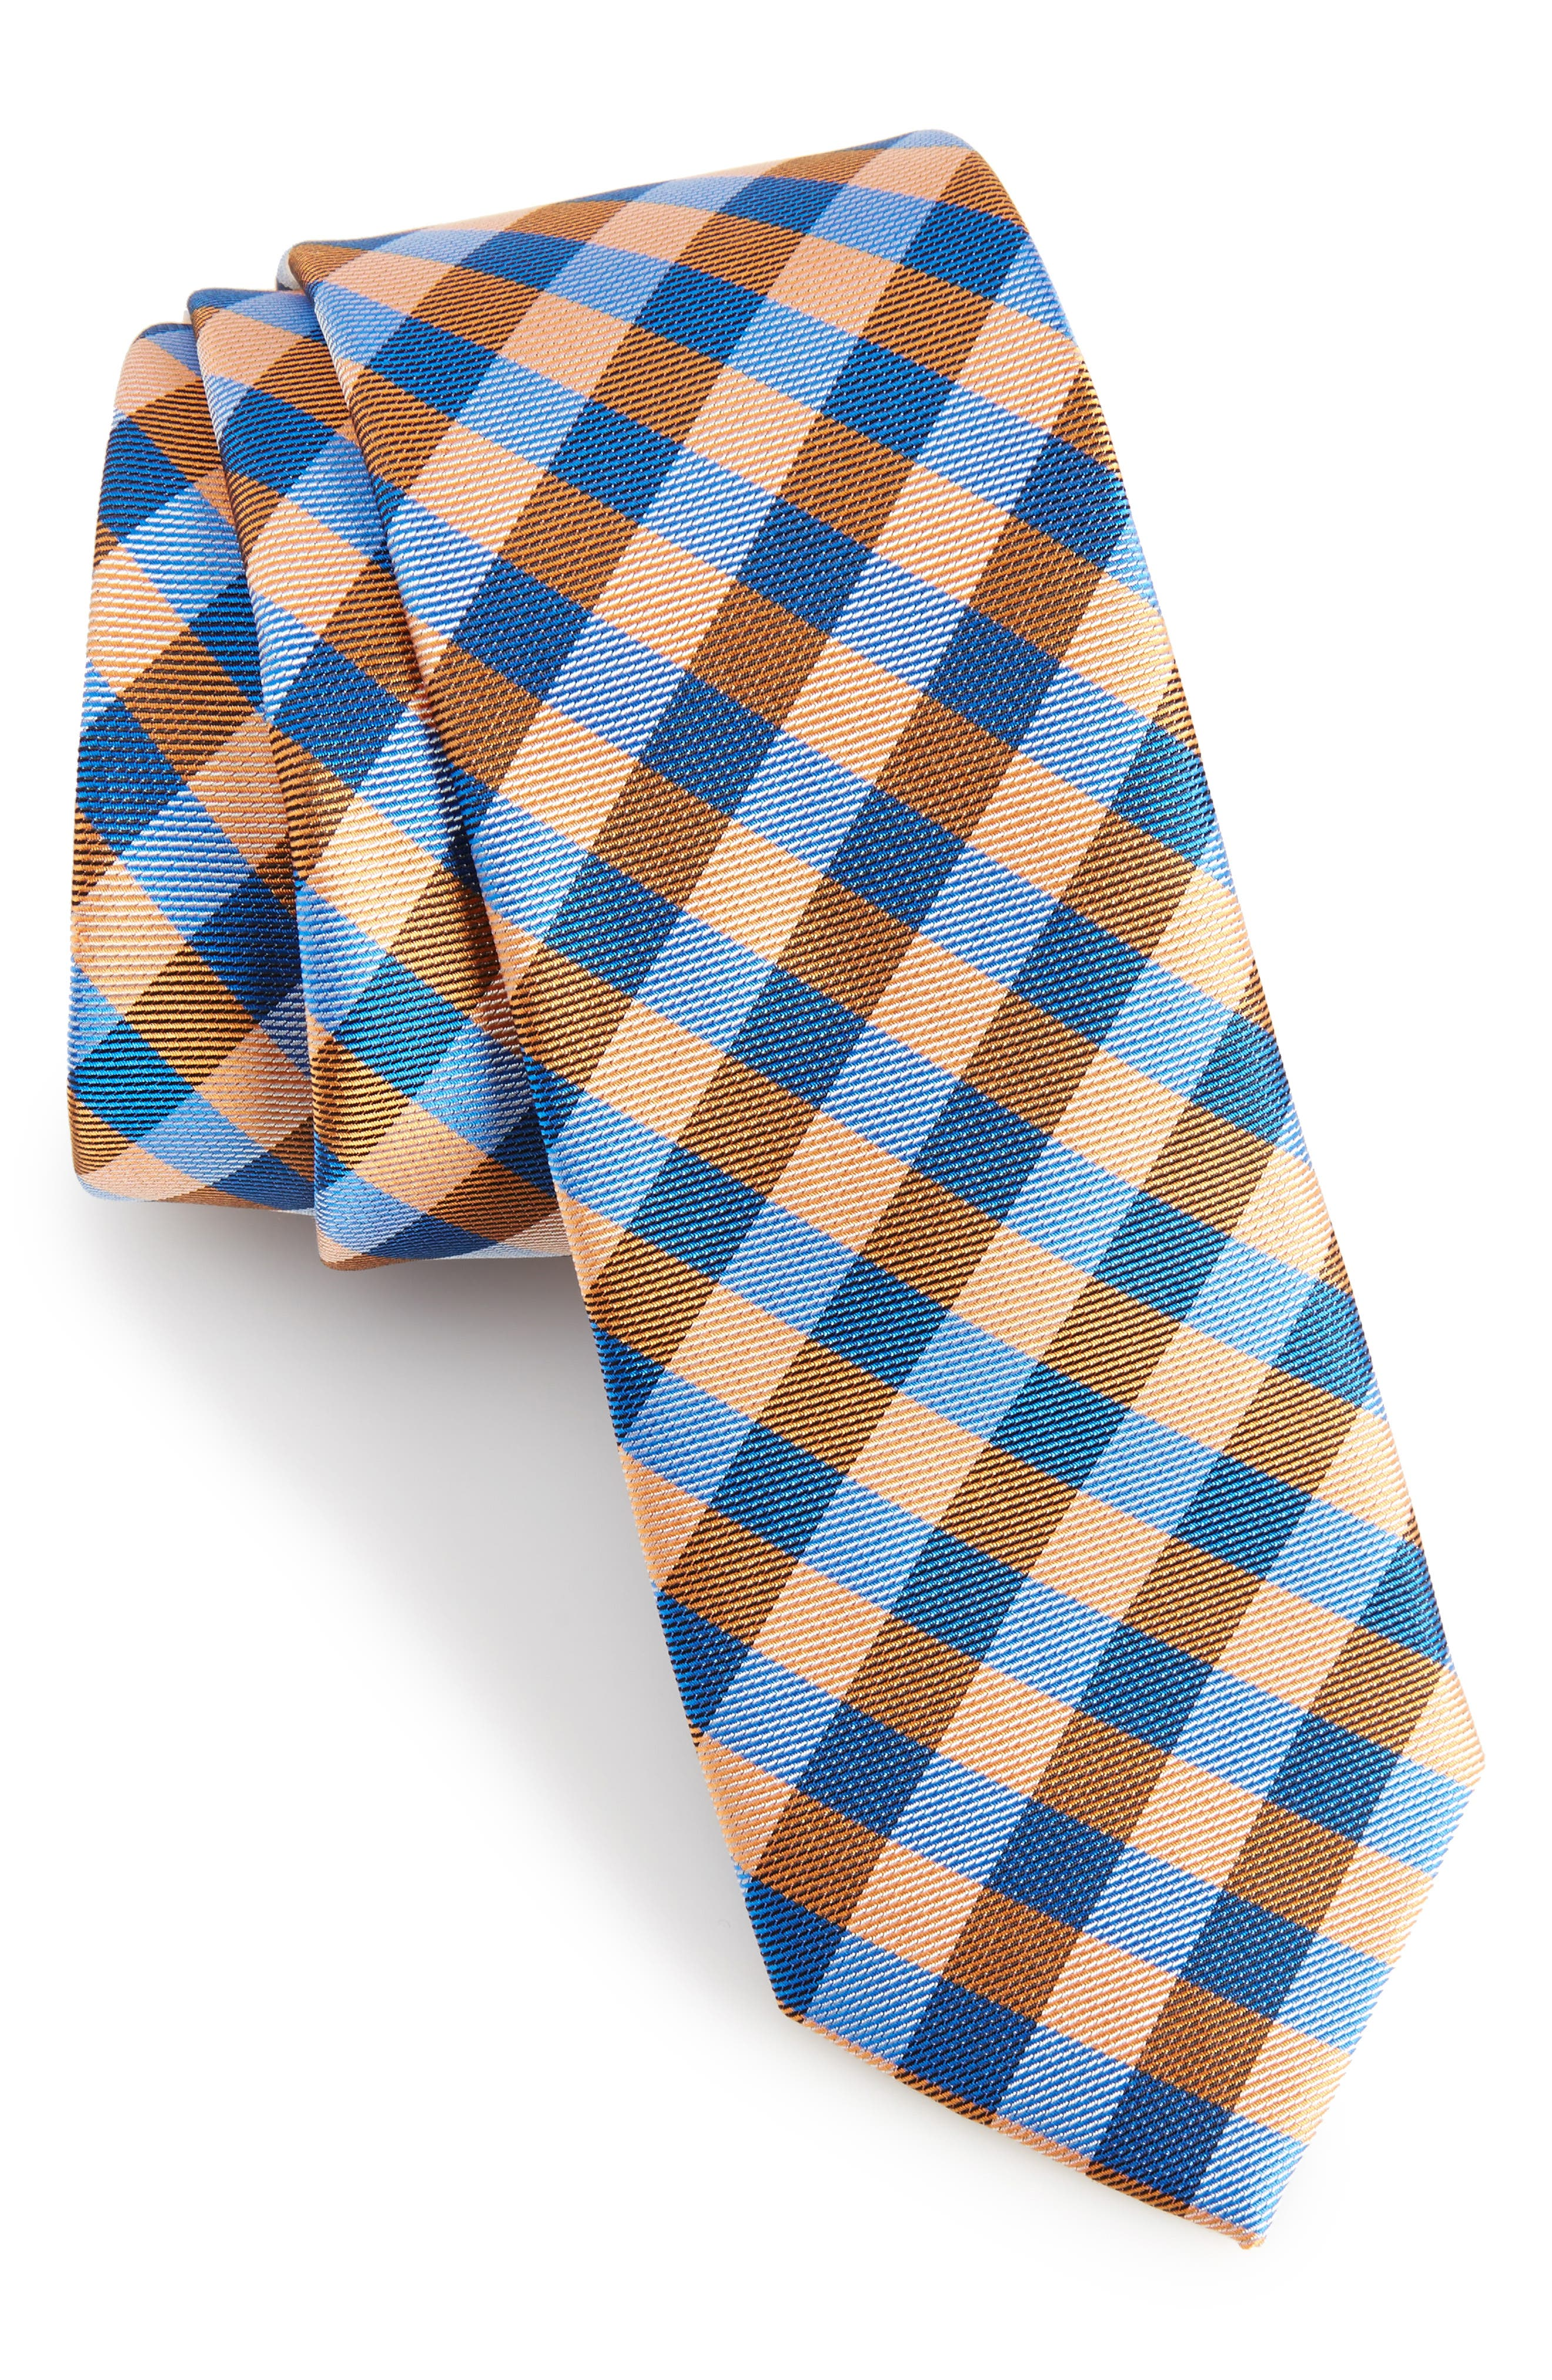 Alternate Image 1 Selected - 1901 Lopez Check Silk Skinny Tie